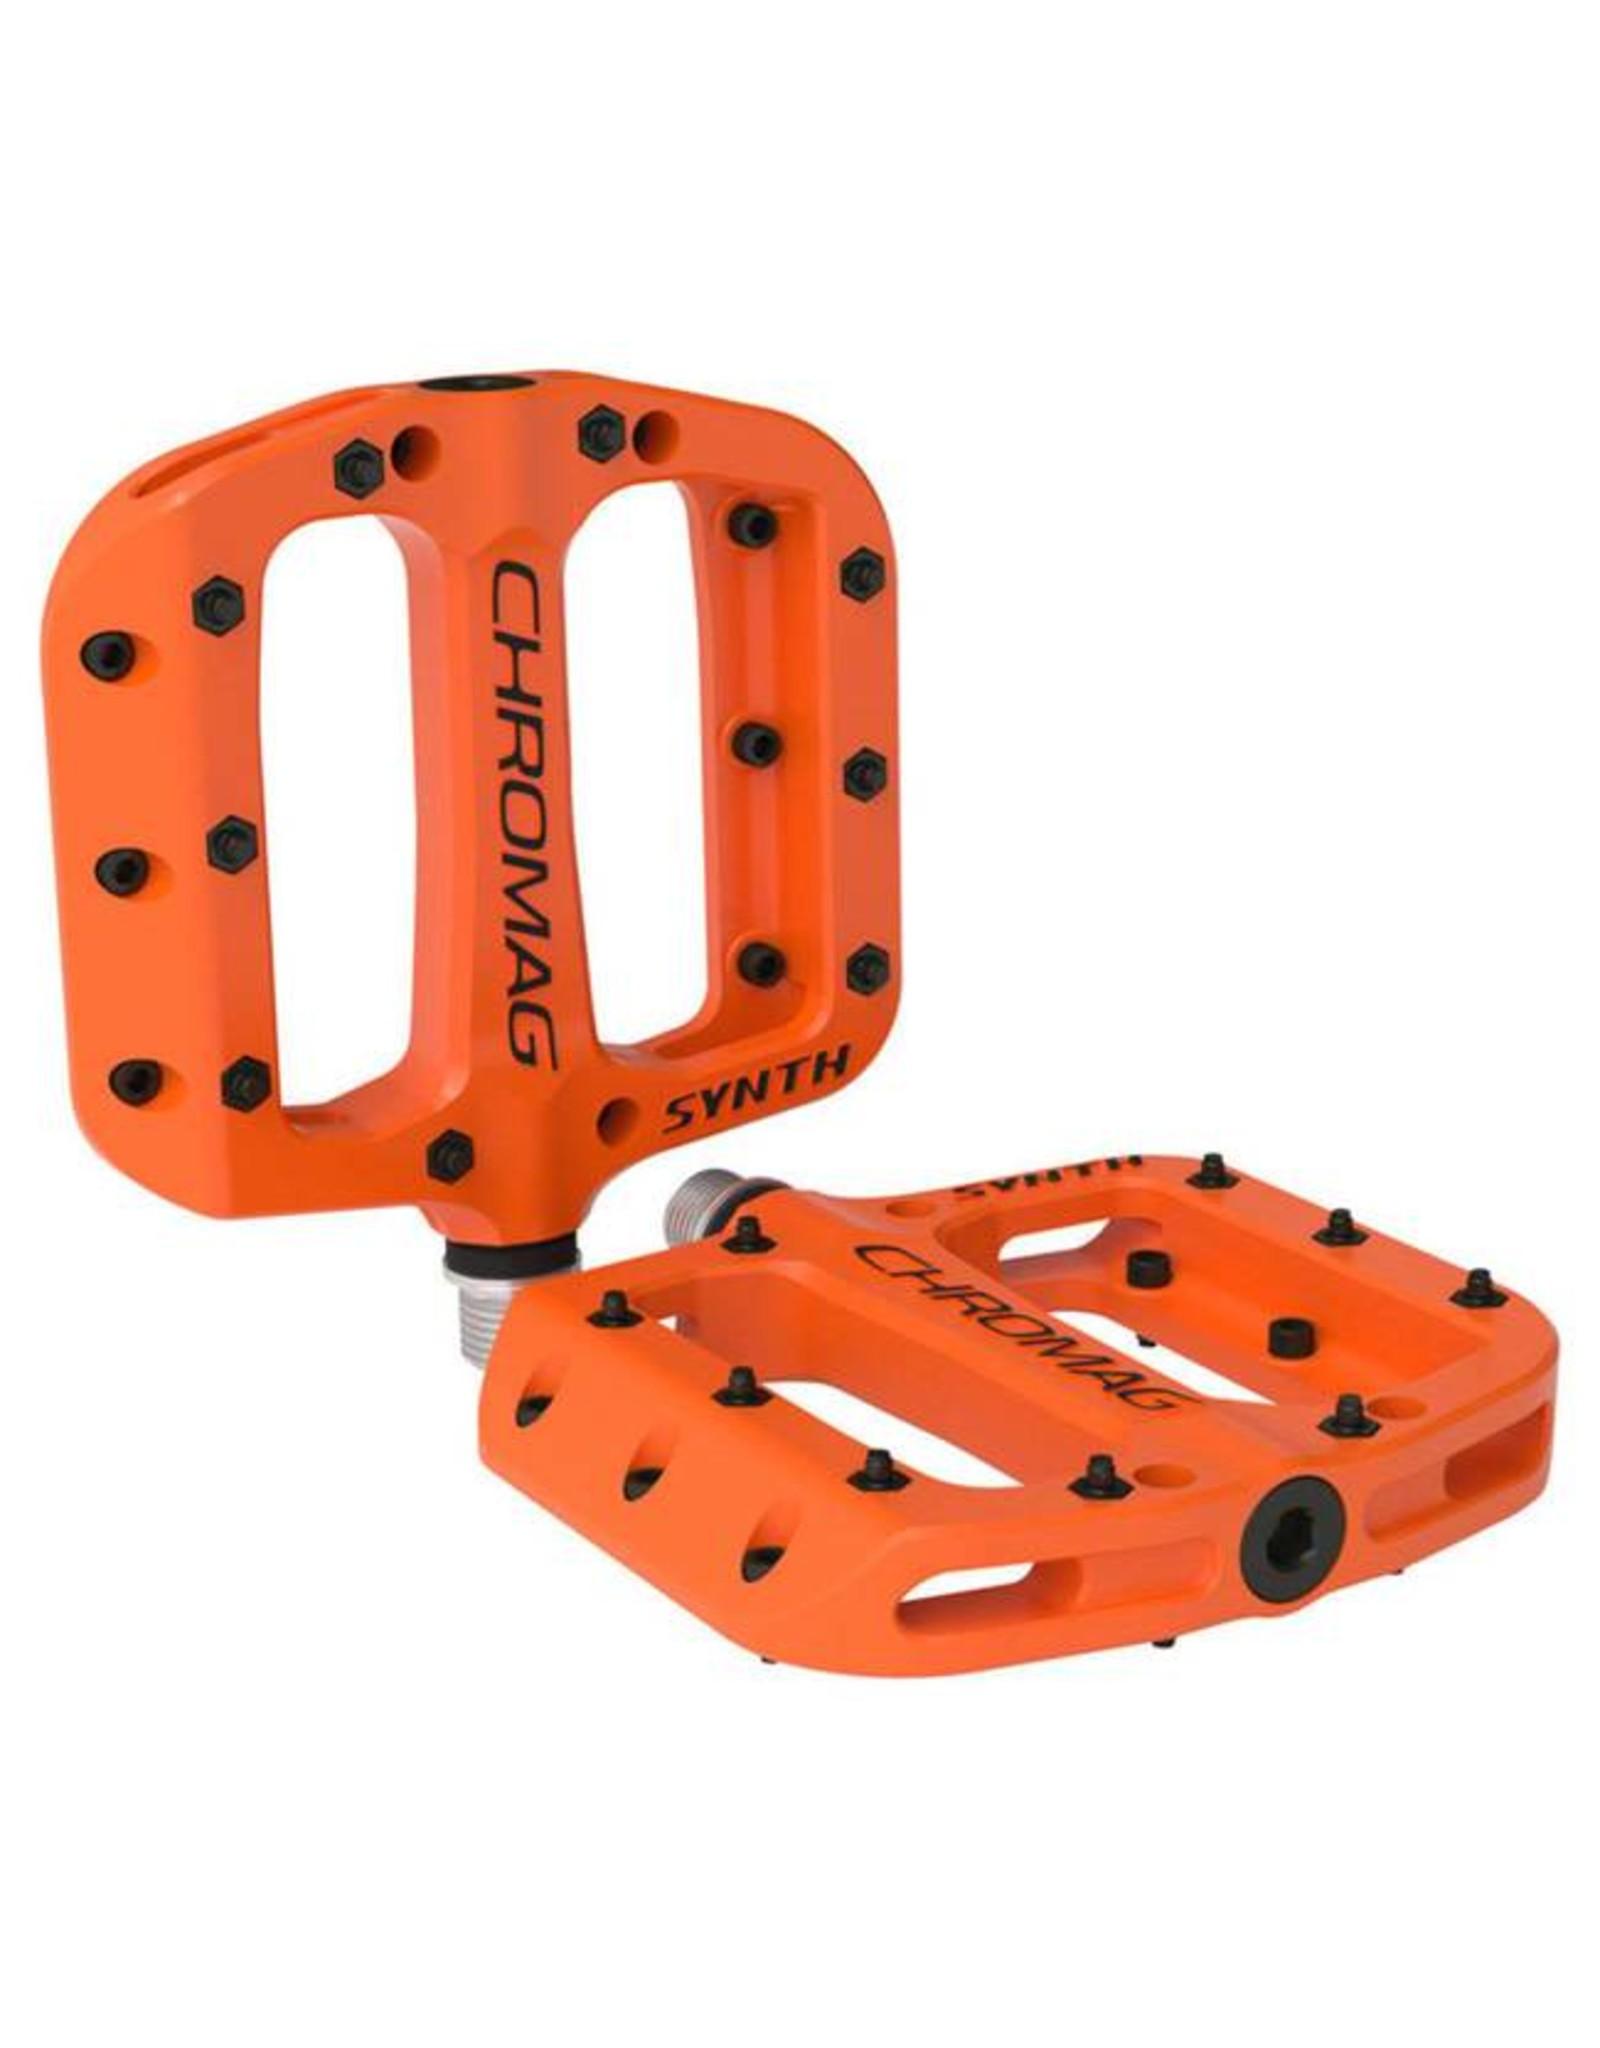 "Chromag Synth Composite Platform Pedals: 9/16"", Orange"